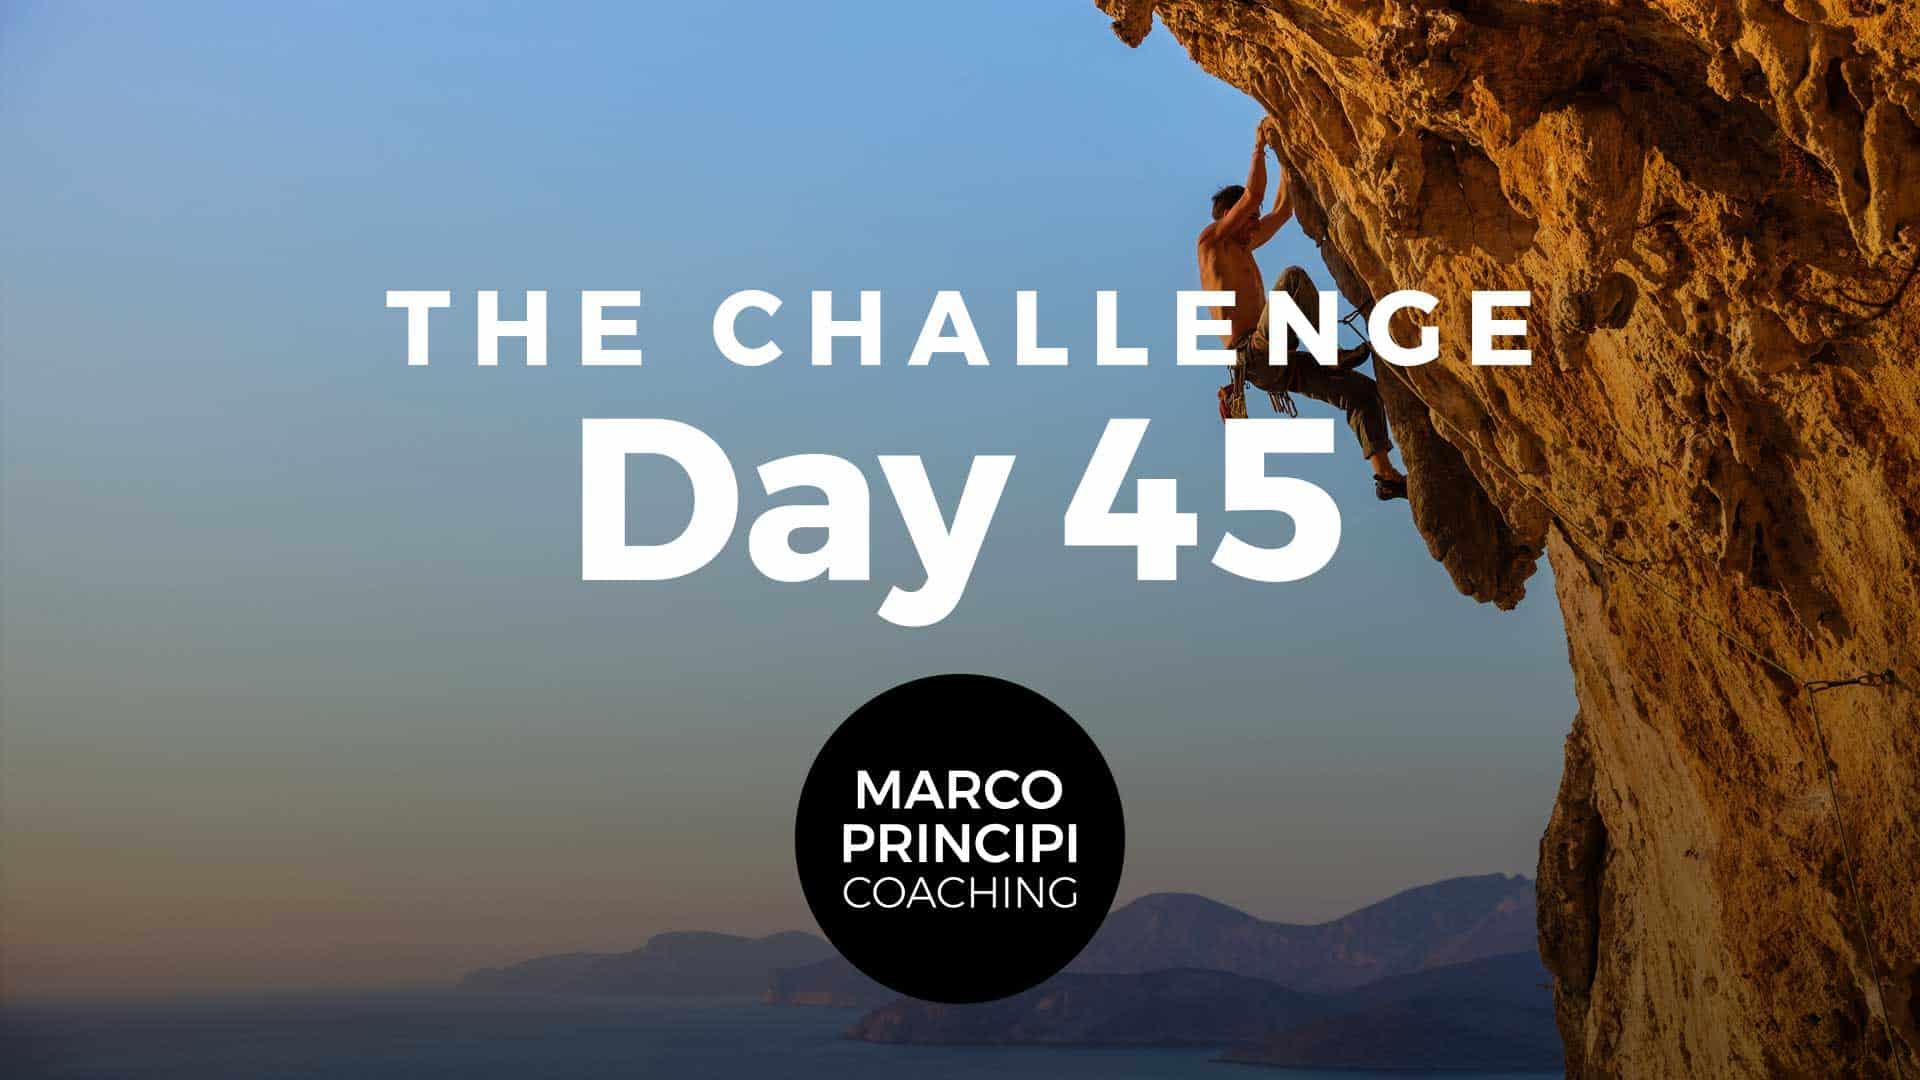 Marco Principi The Challenge Day 45